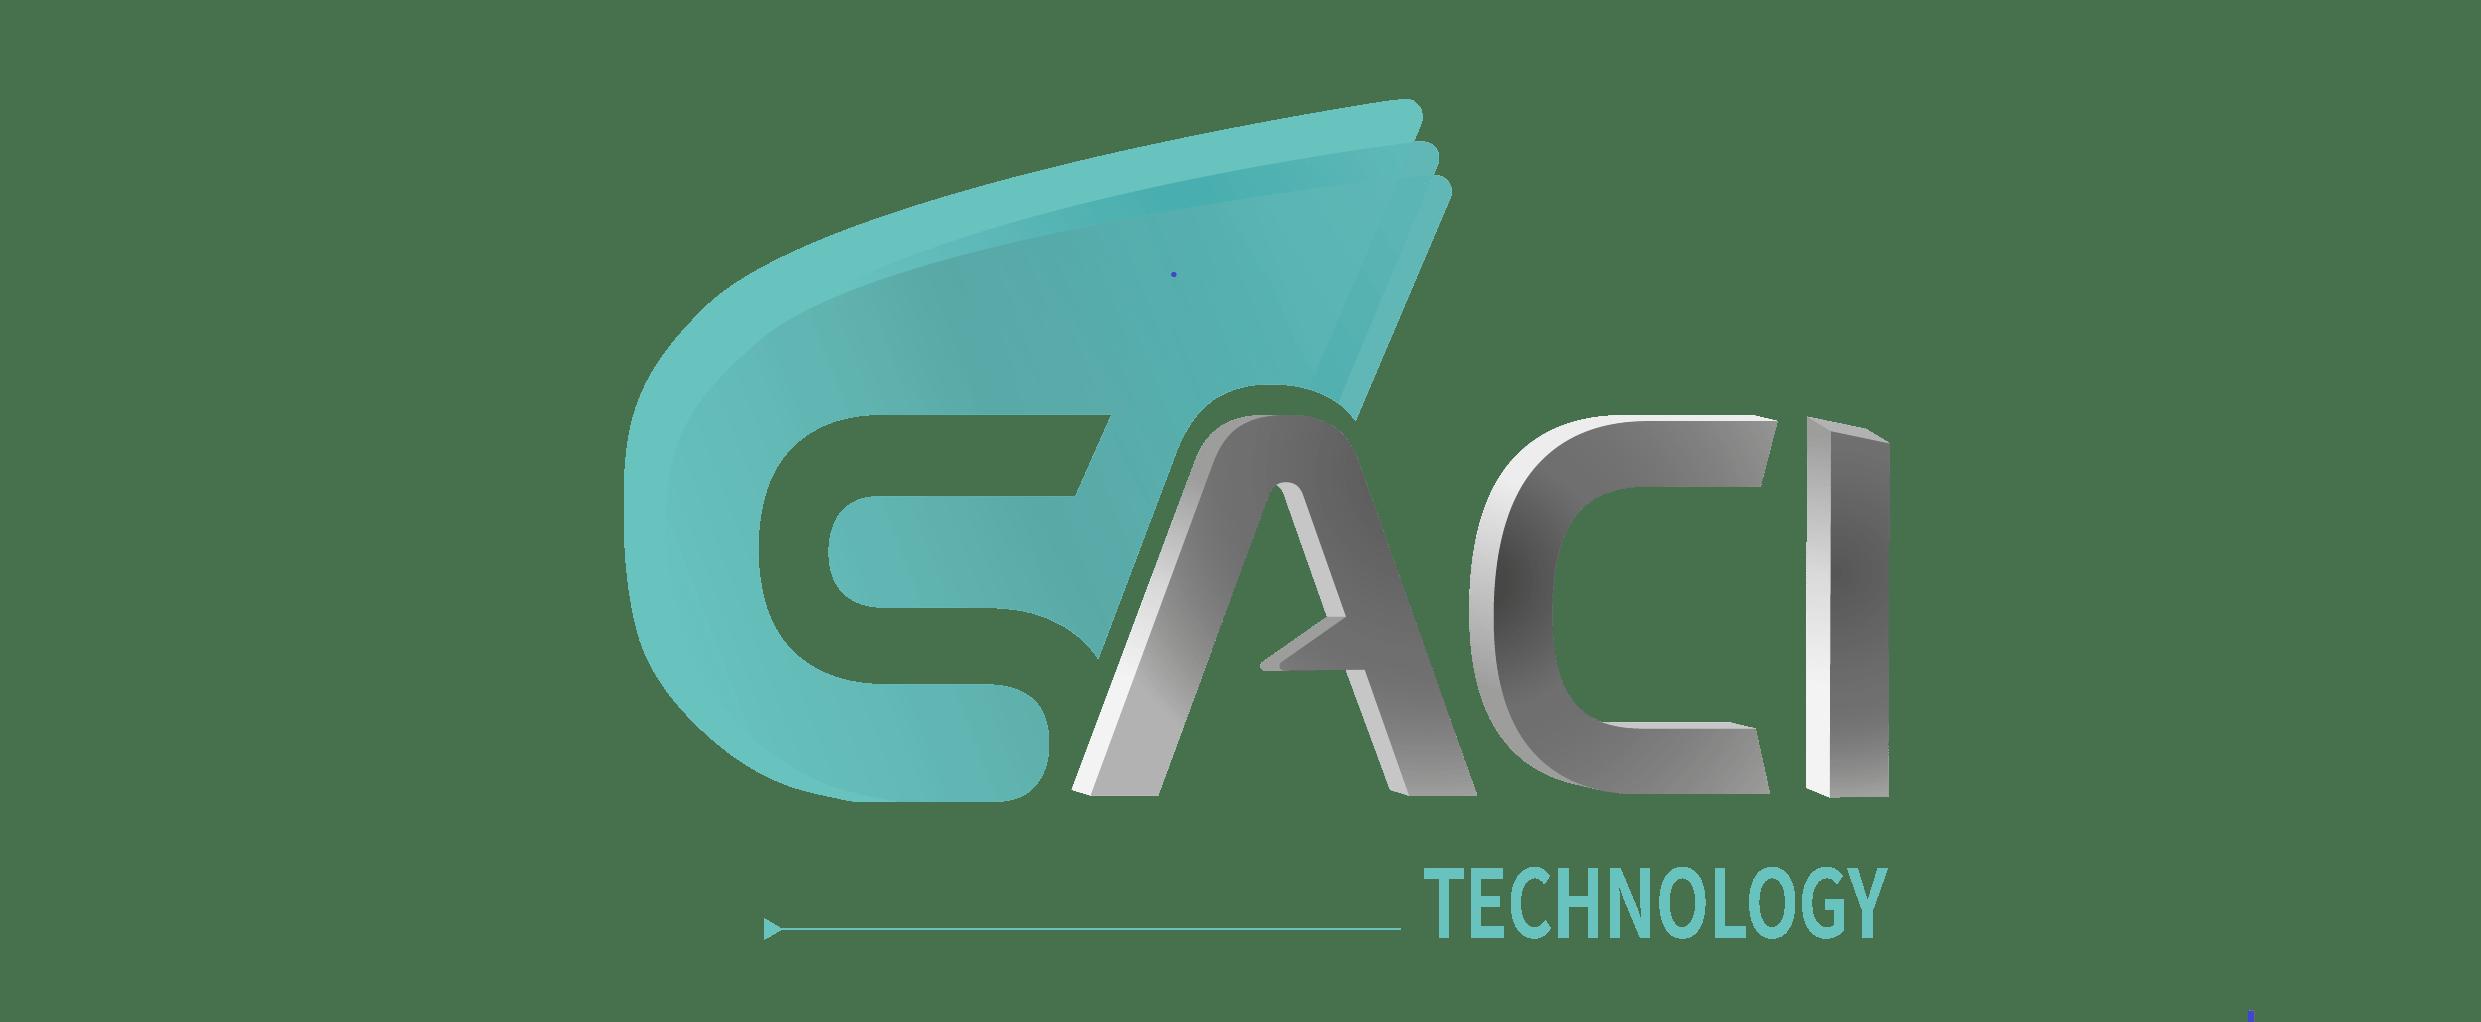 Saci Technology